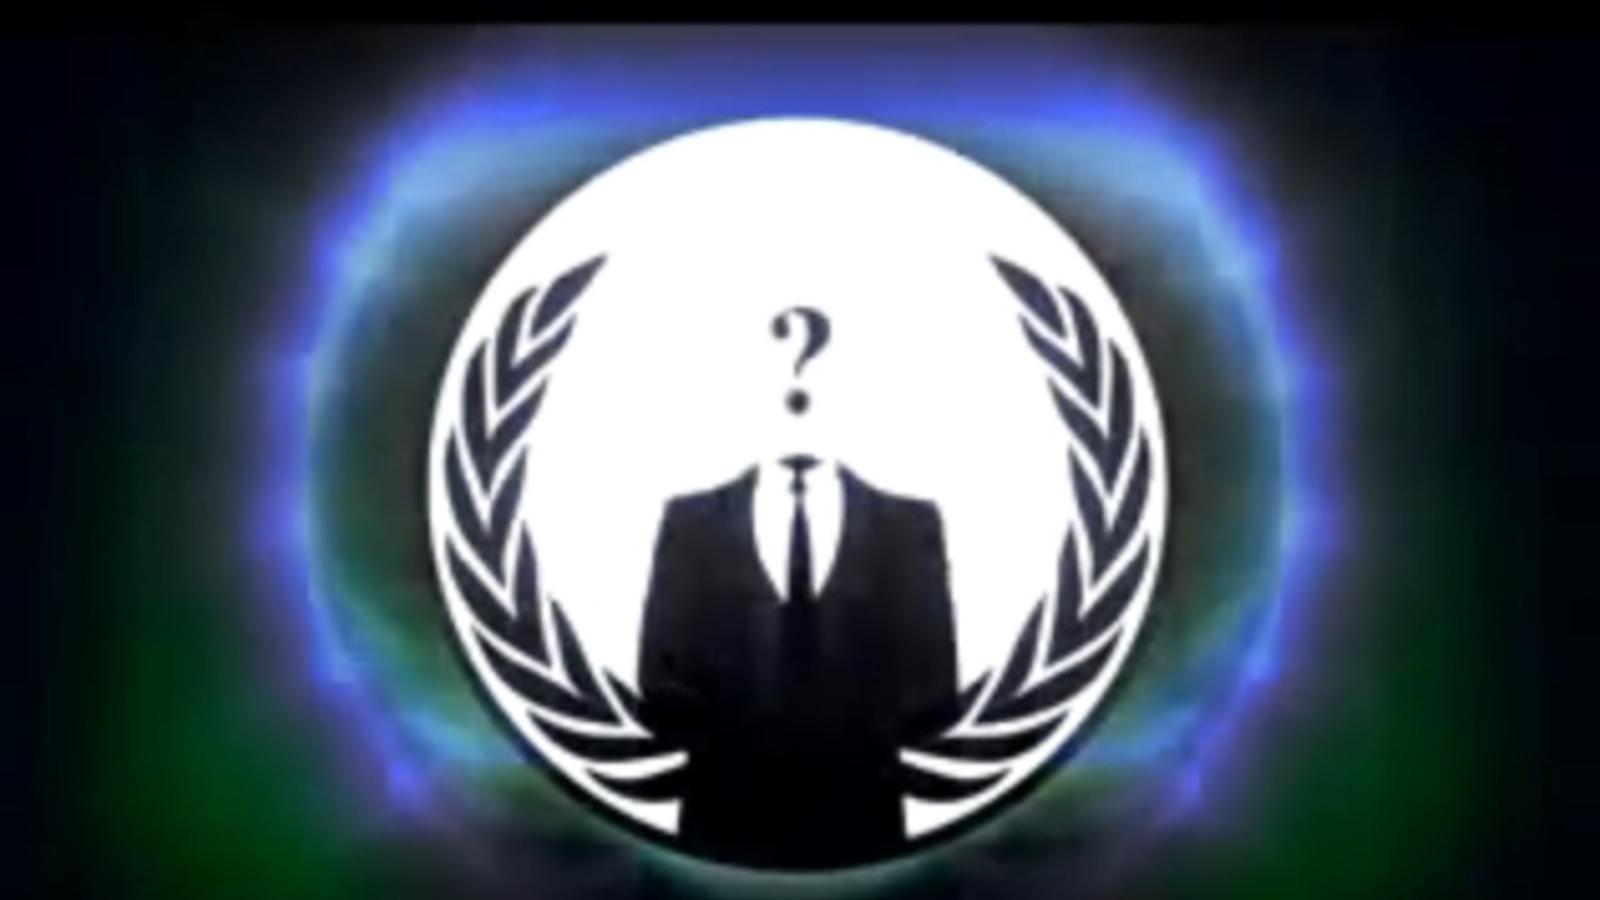 La suposada amenaça d'Anonymous contra Facebook